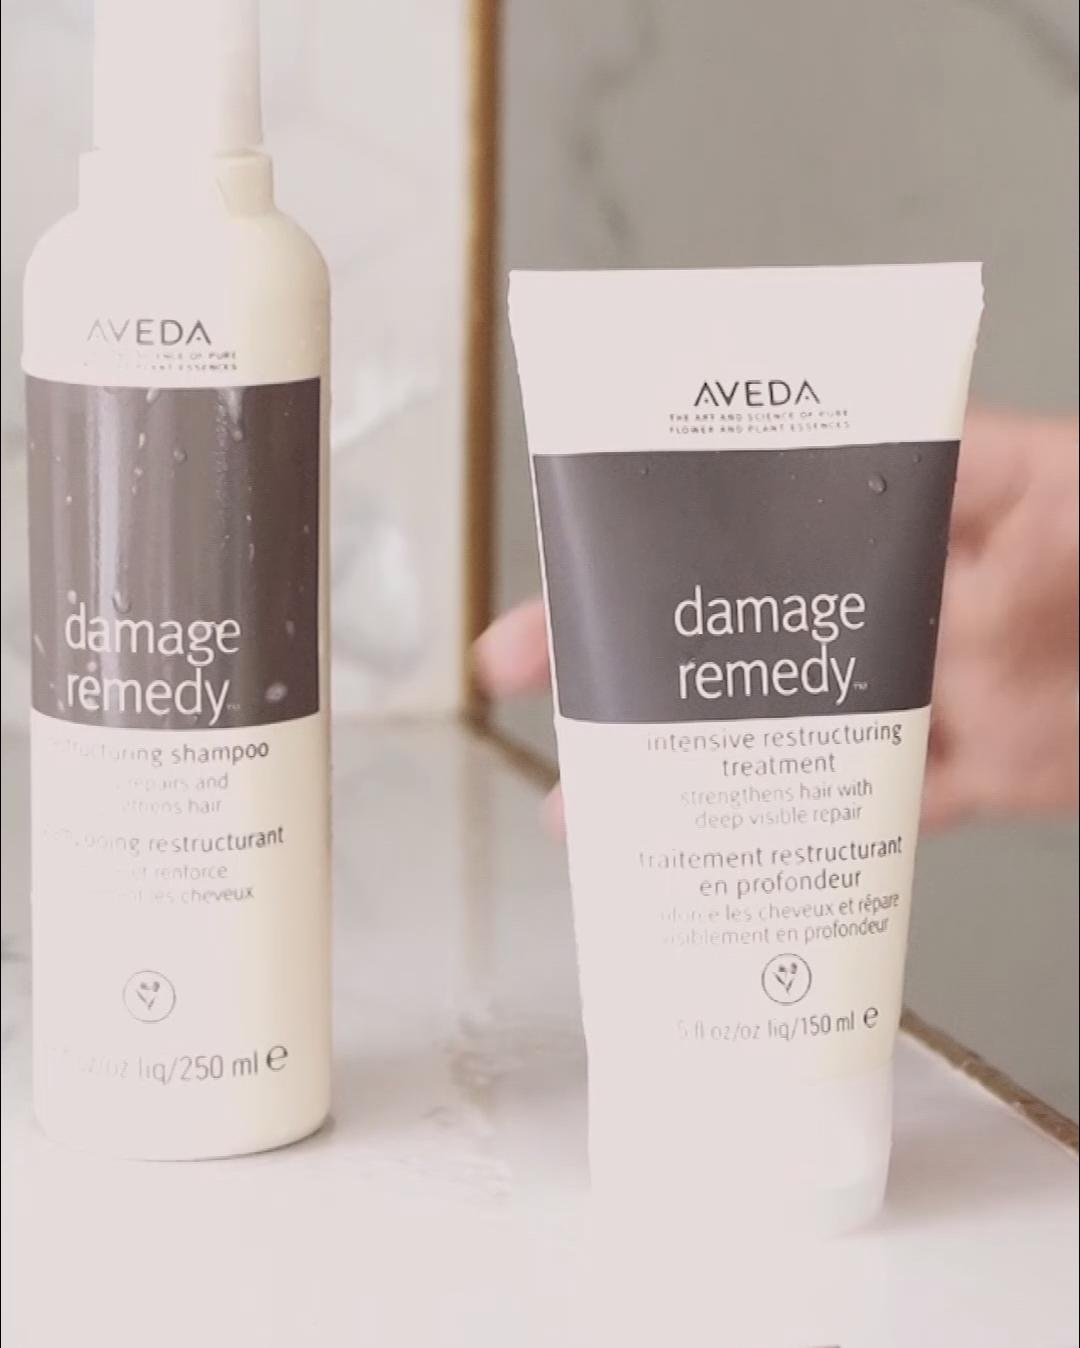 Mpp Franchise Damage Remedy Video Video Hair Care Damage Hair Care Products For Damaged Hair